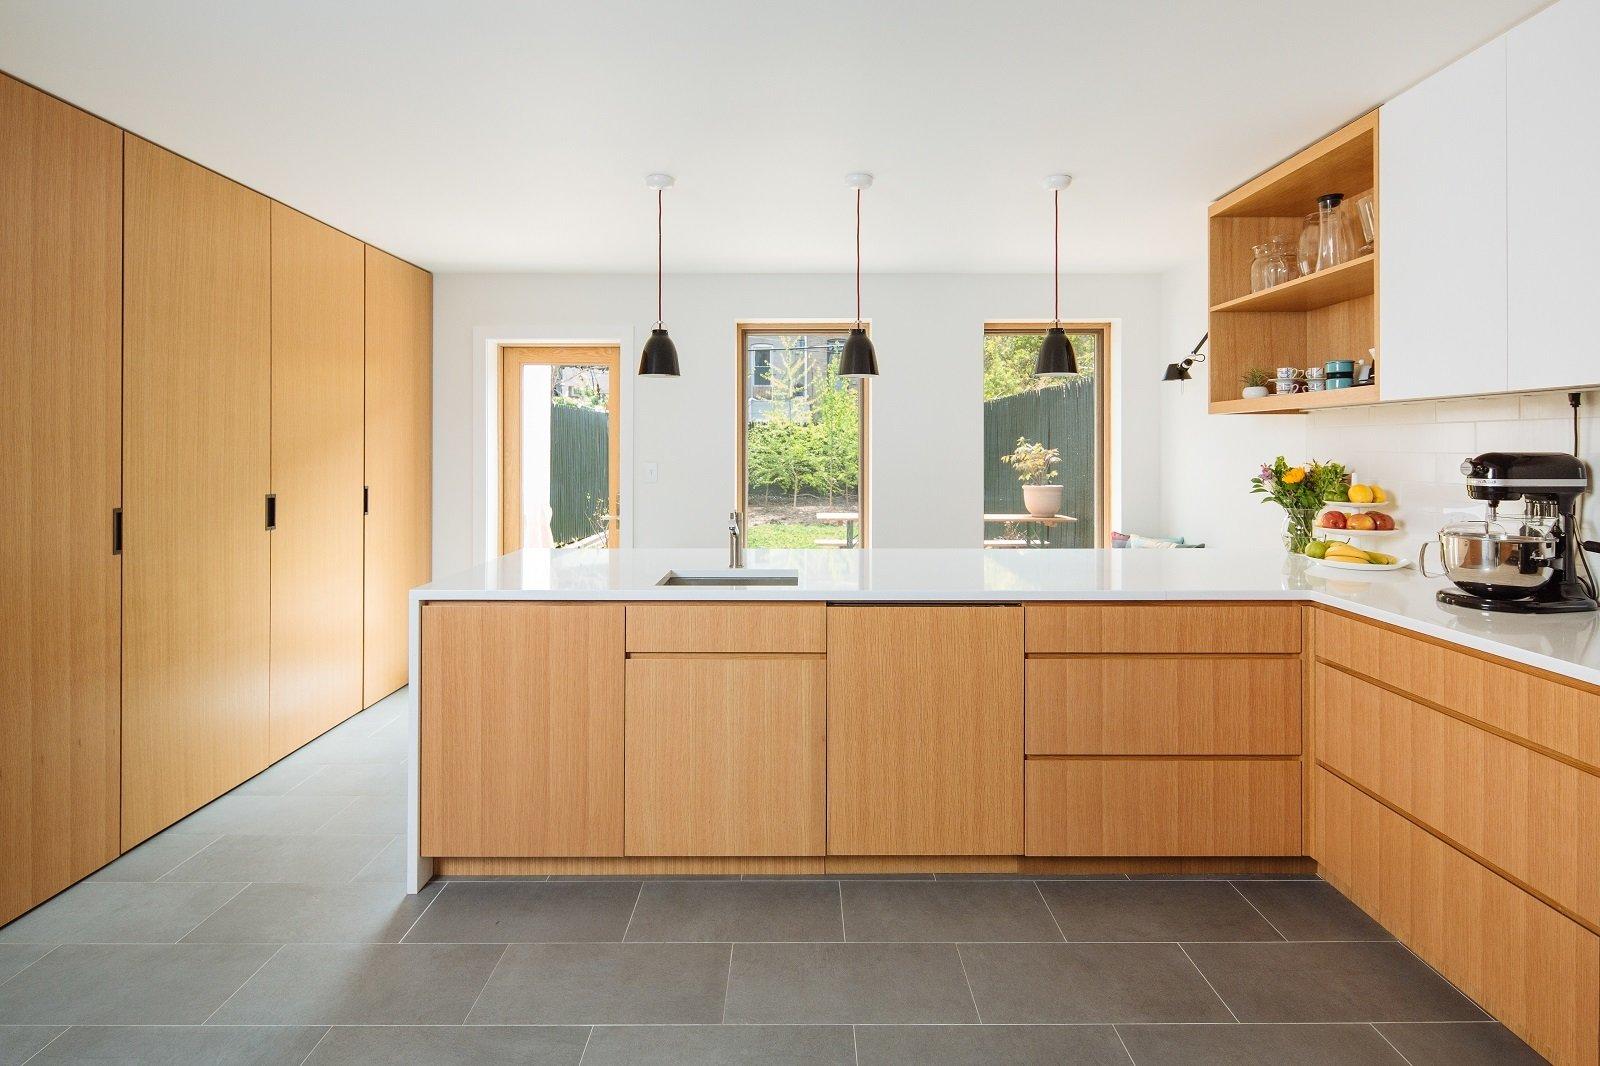 Custom white oak cabinetry provides a clean interior